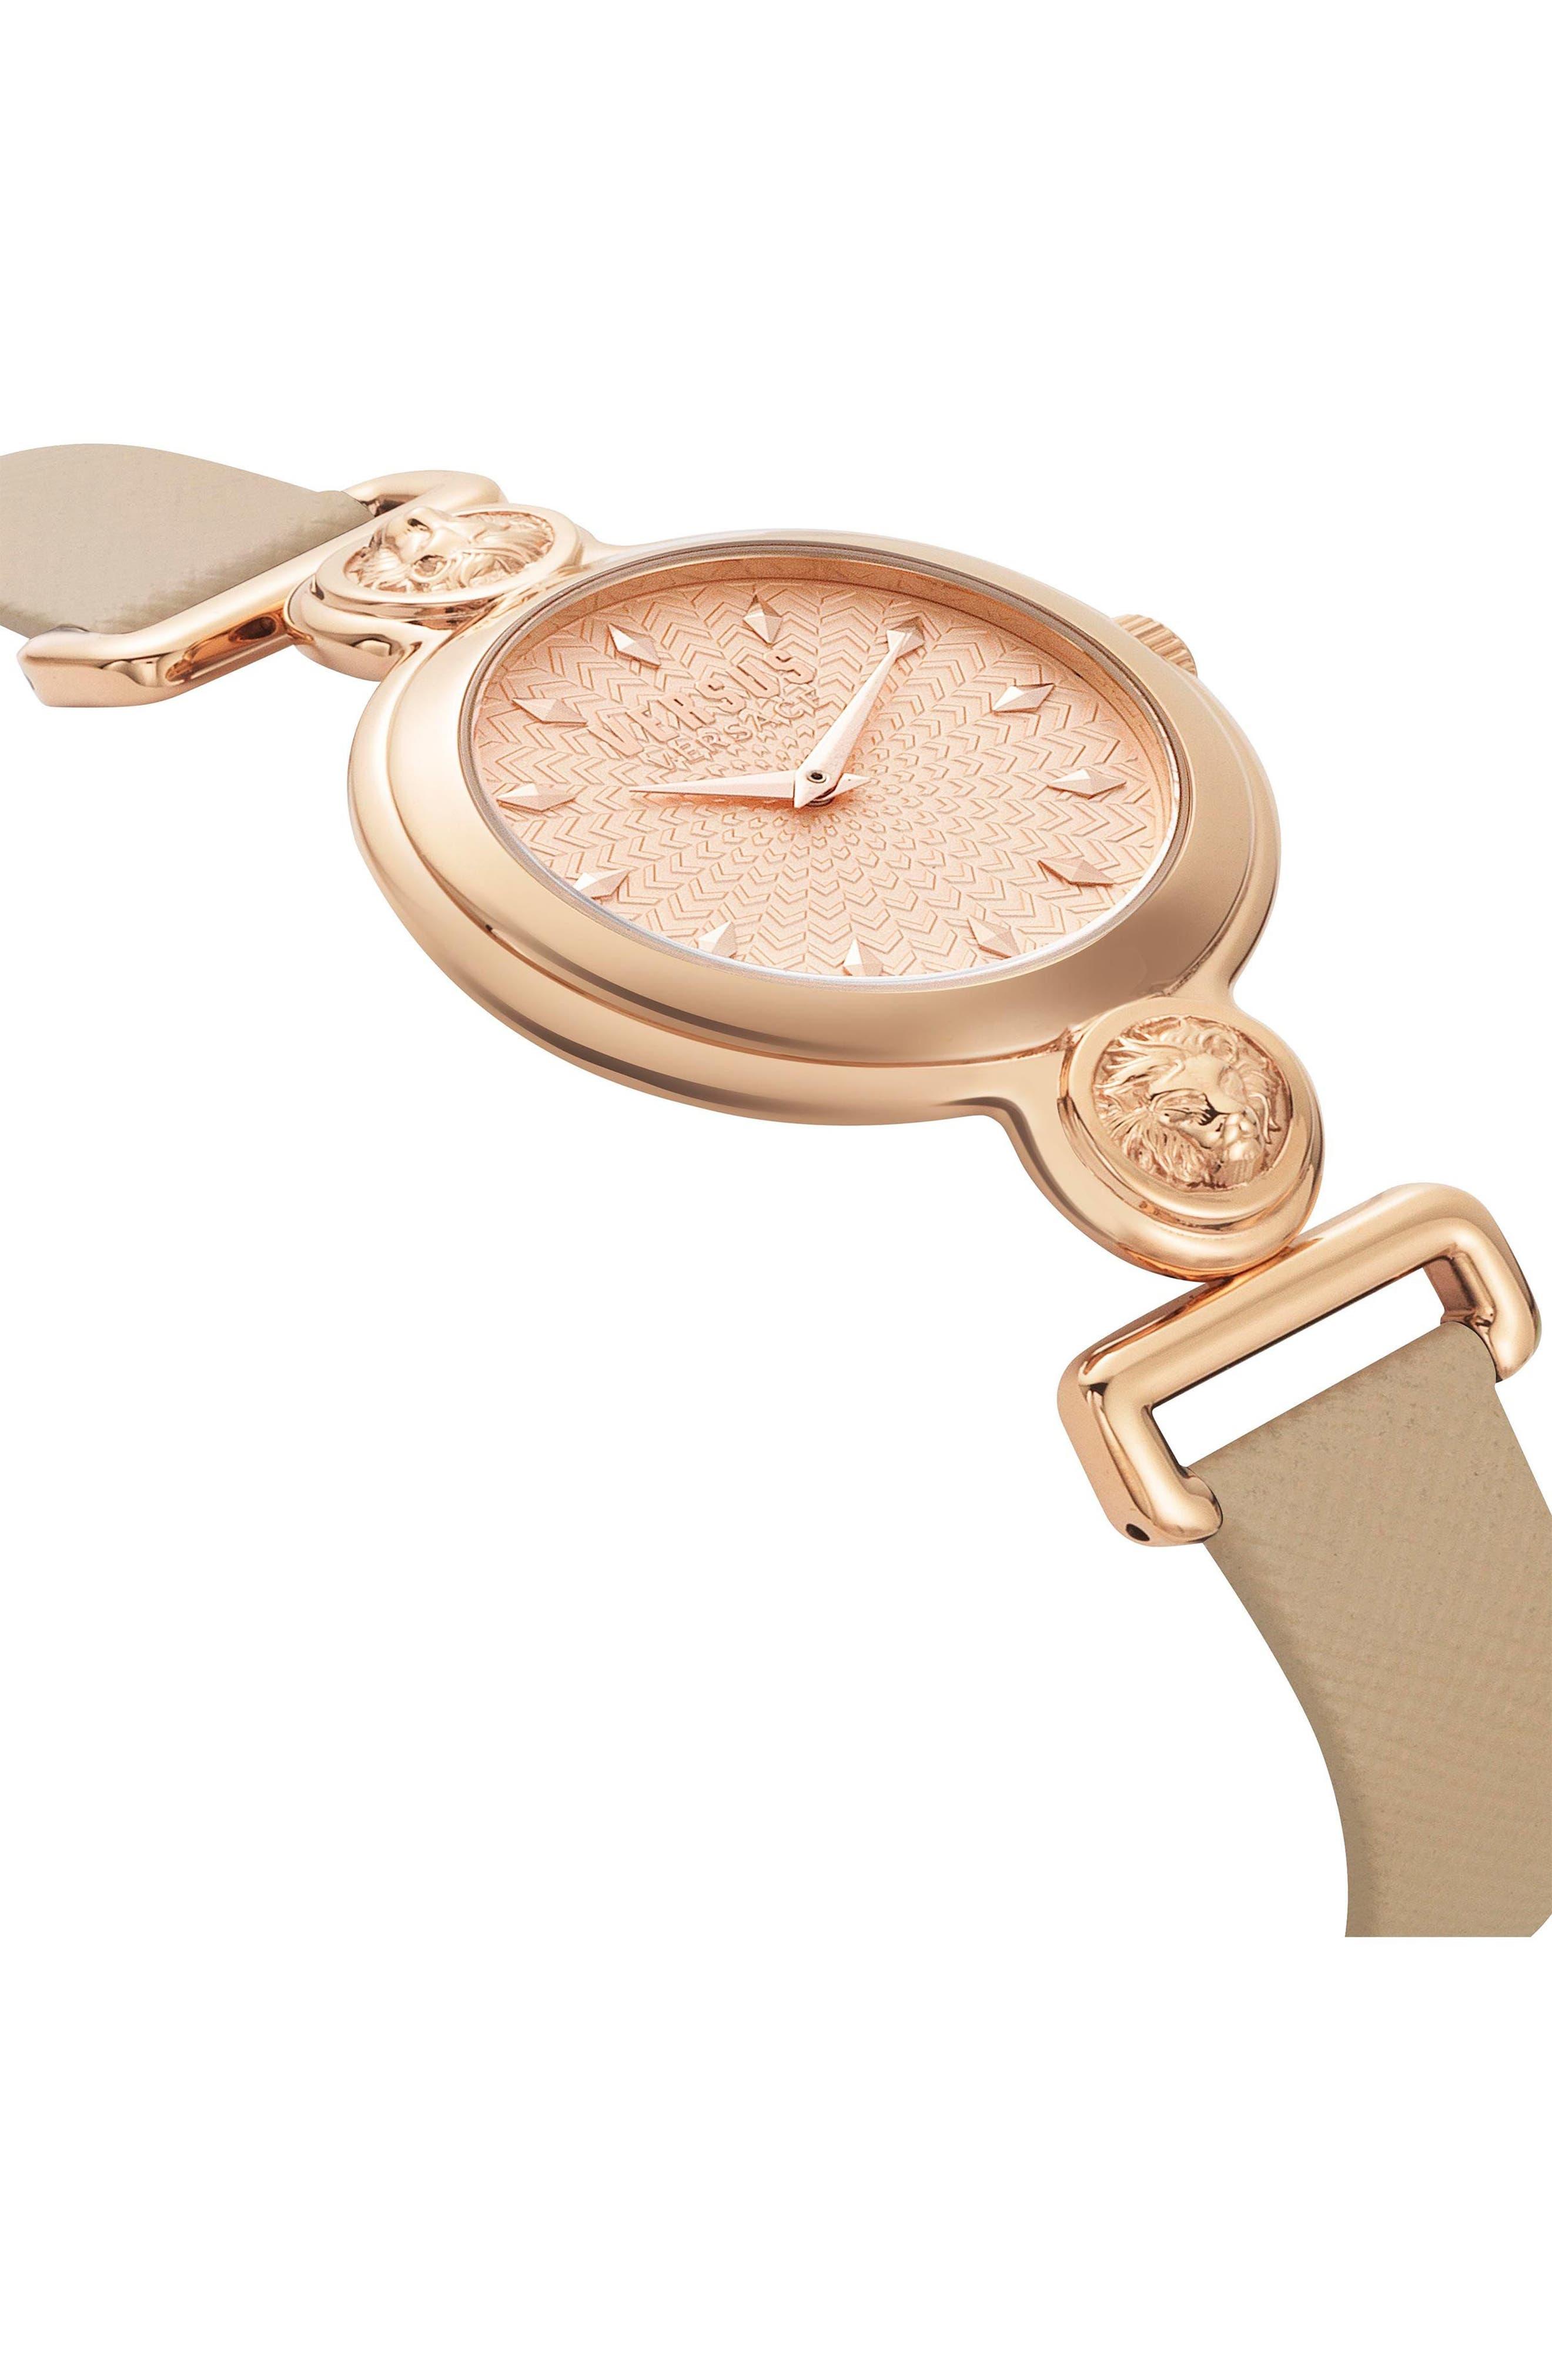 VERSUS by Versace Sunnyridge Leather Strap Watch, 34mm,                             Alternate thumbnail 3, color,                             Blush/ Rose Gold